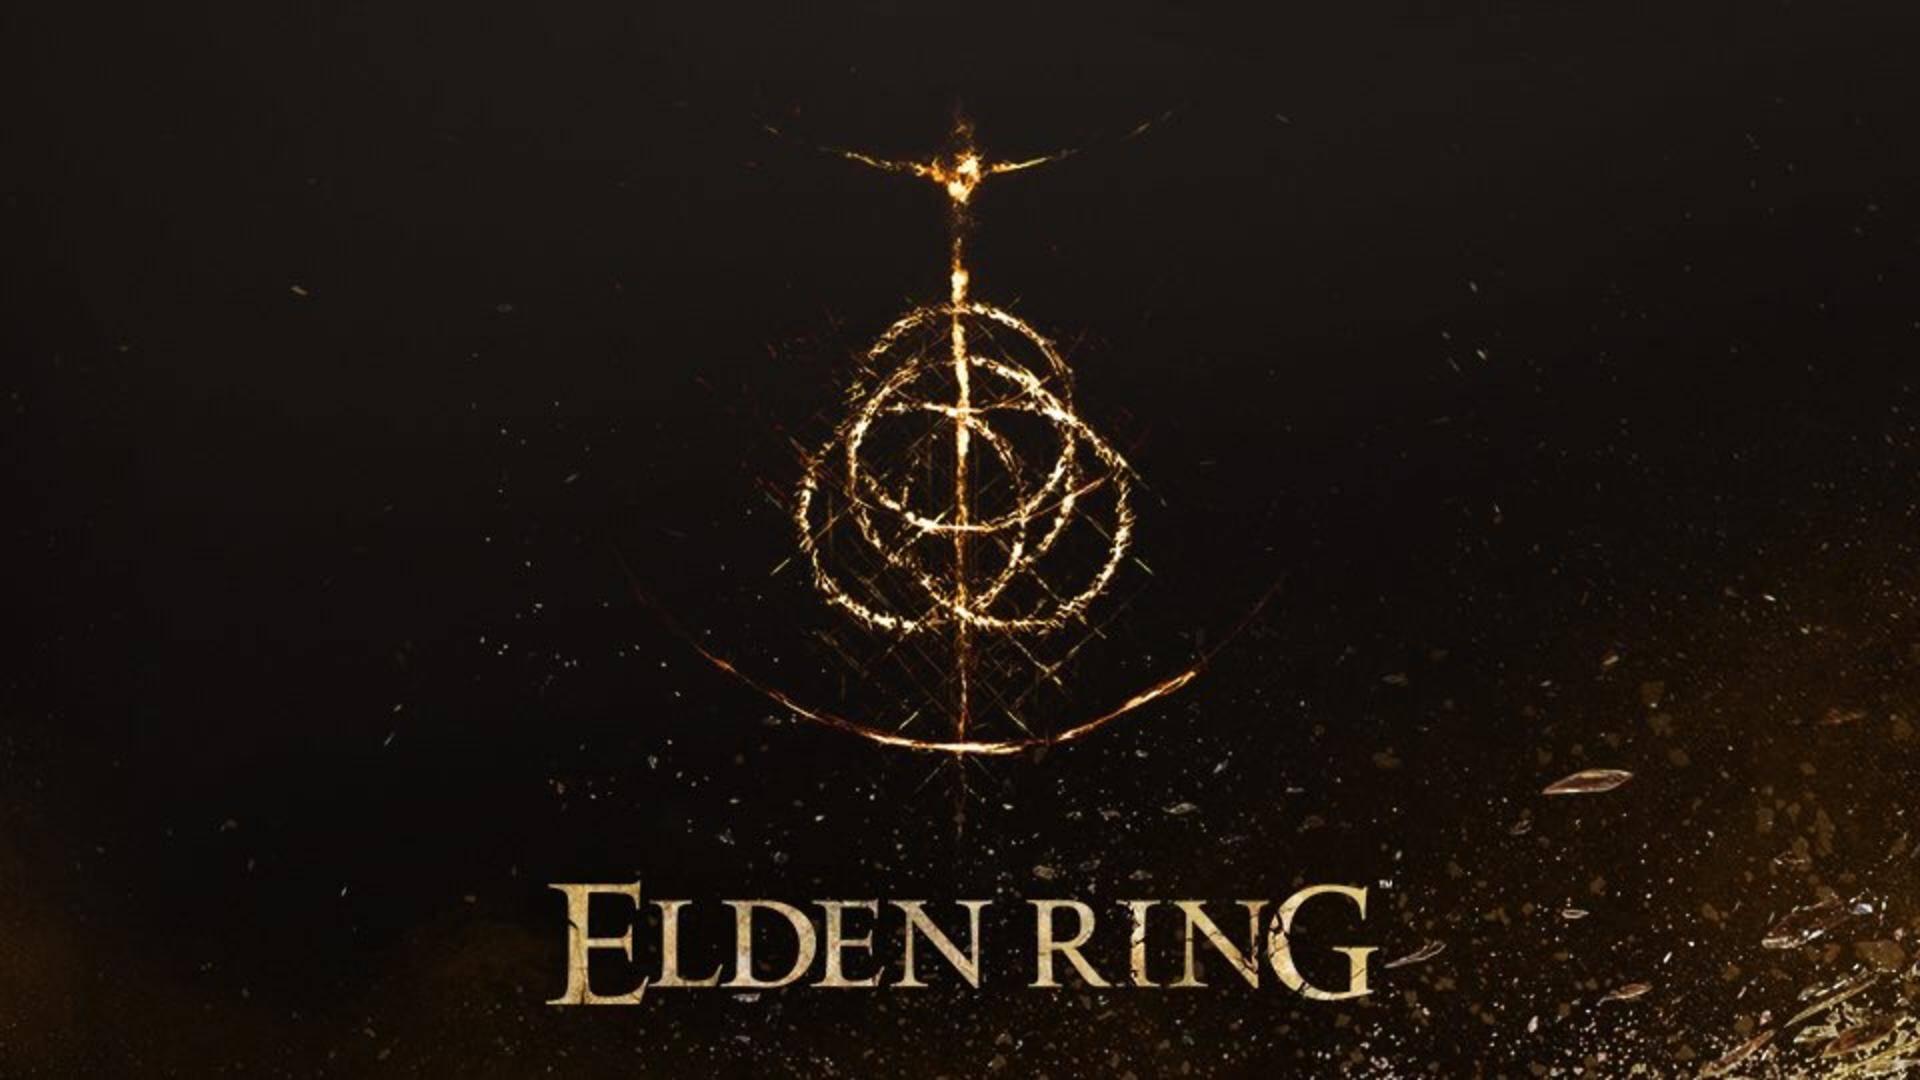 elden-ring-jeff-grubb-nuove-notizie